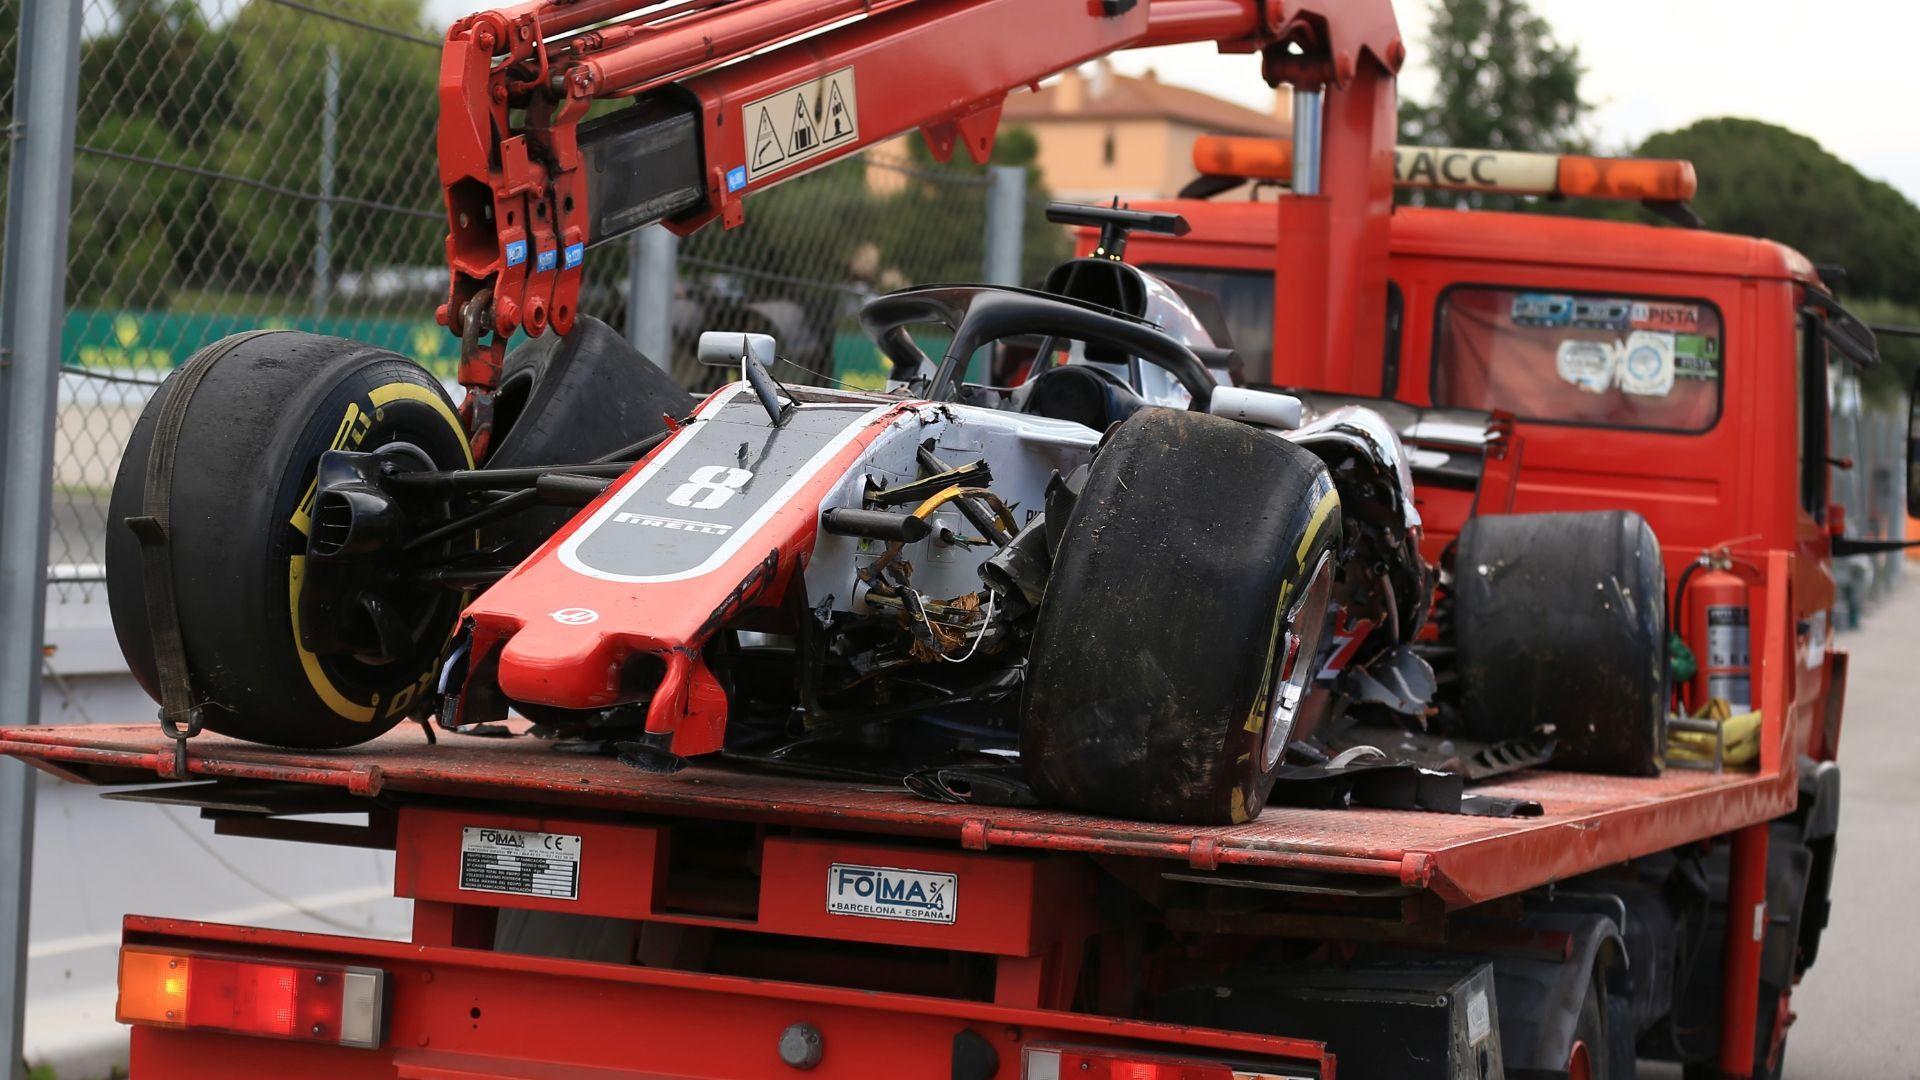 Grosjean's struggles continue on the track